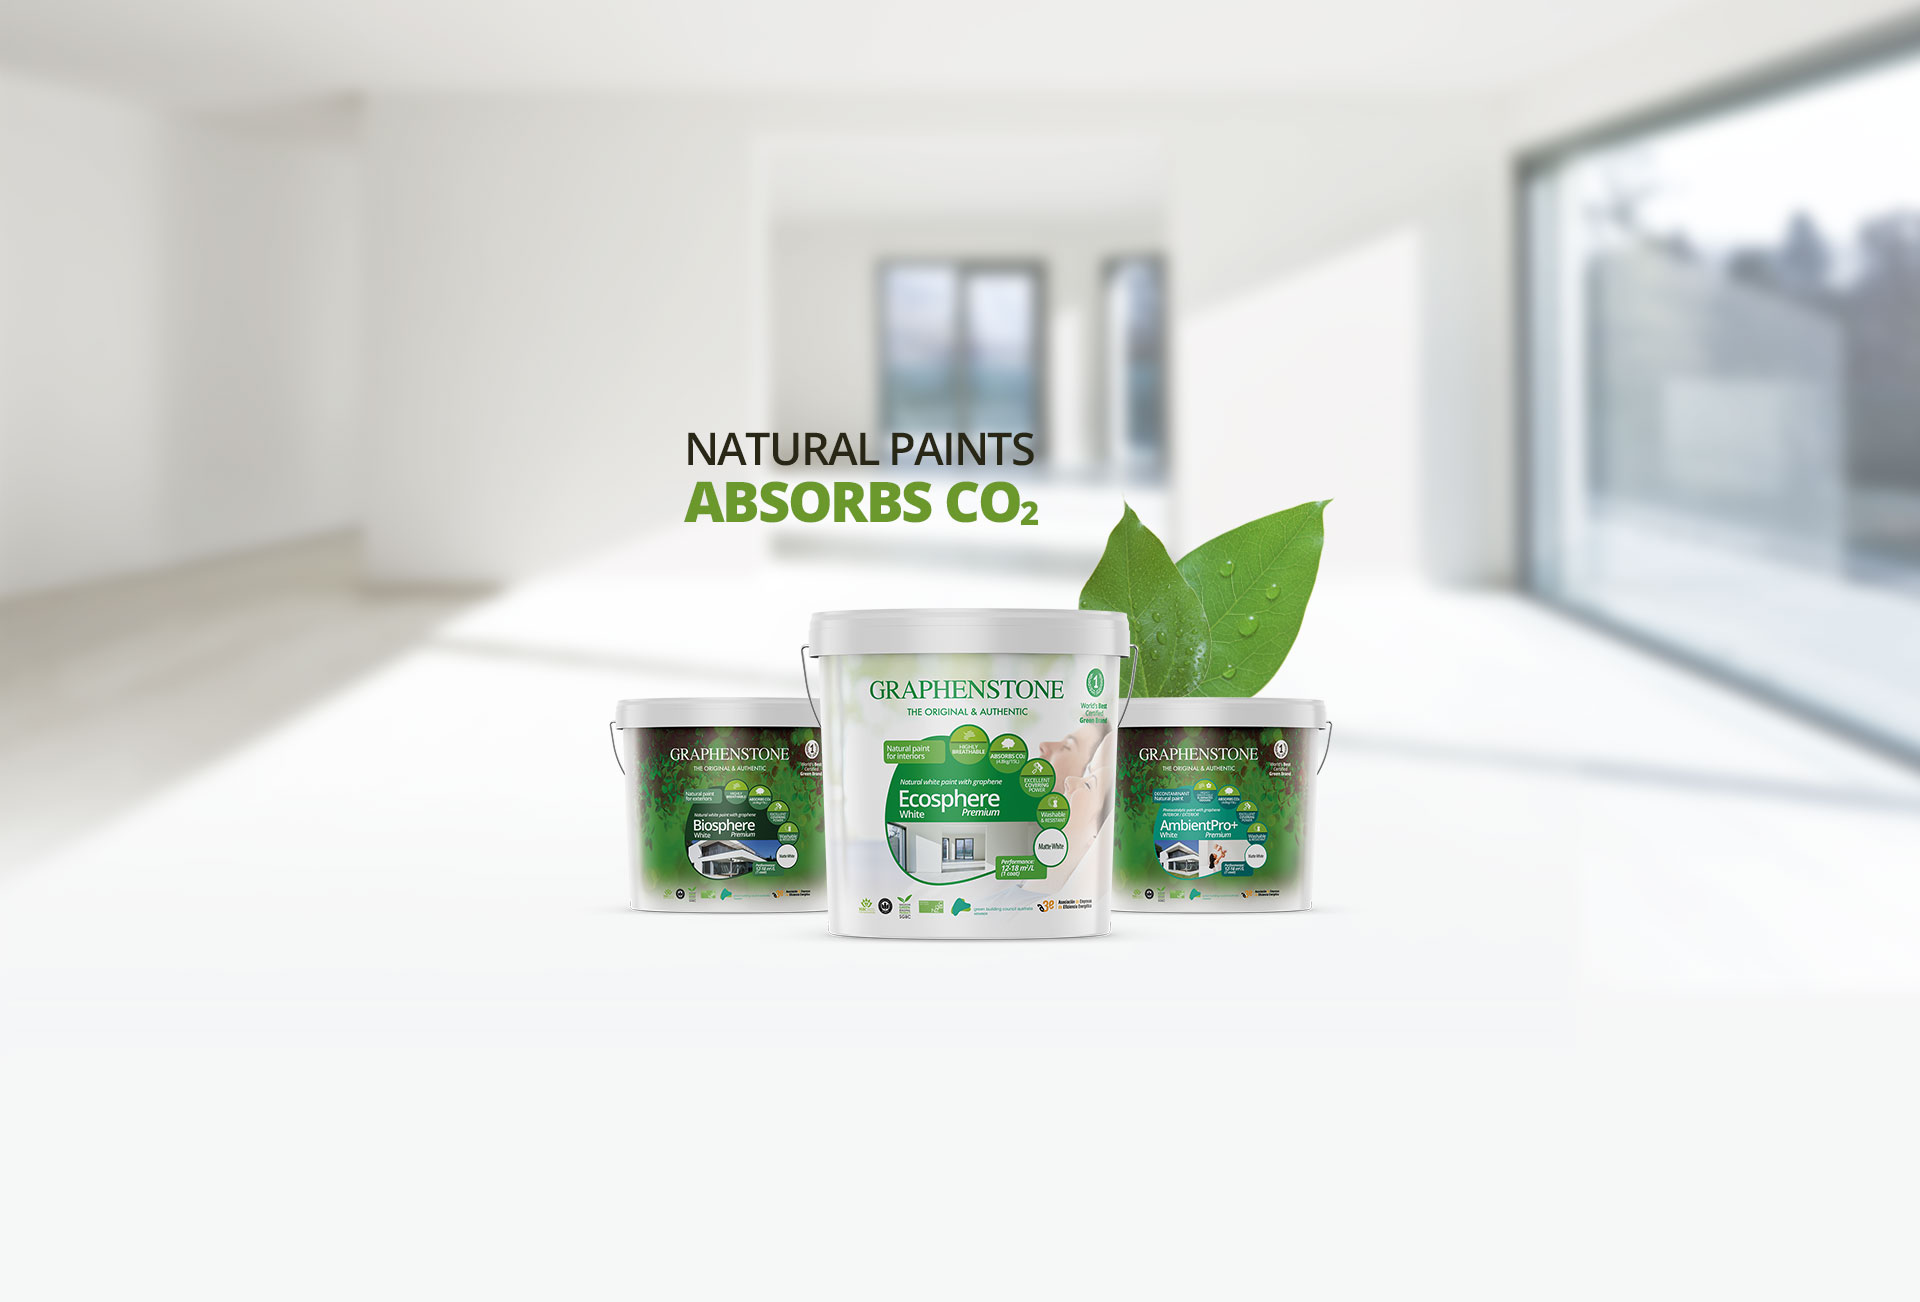 Graphenstone natural paints